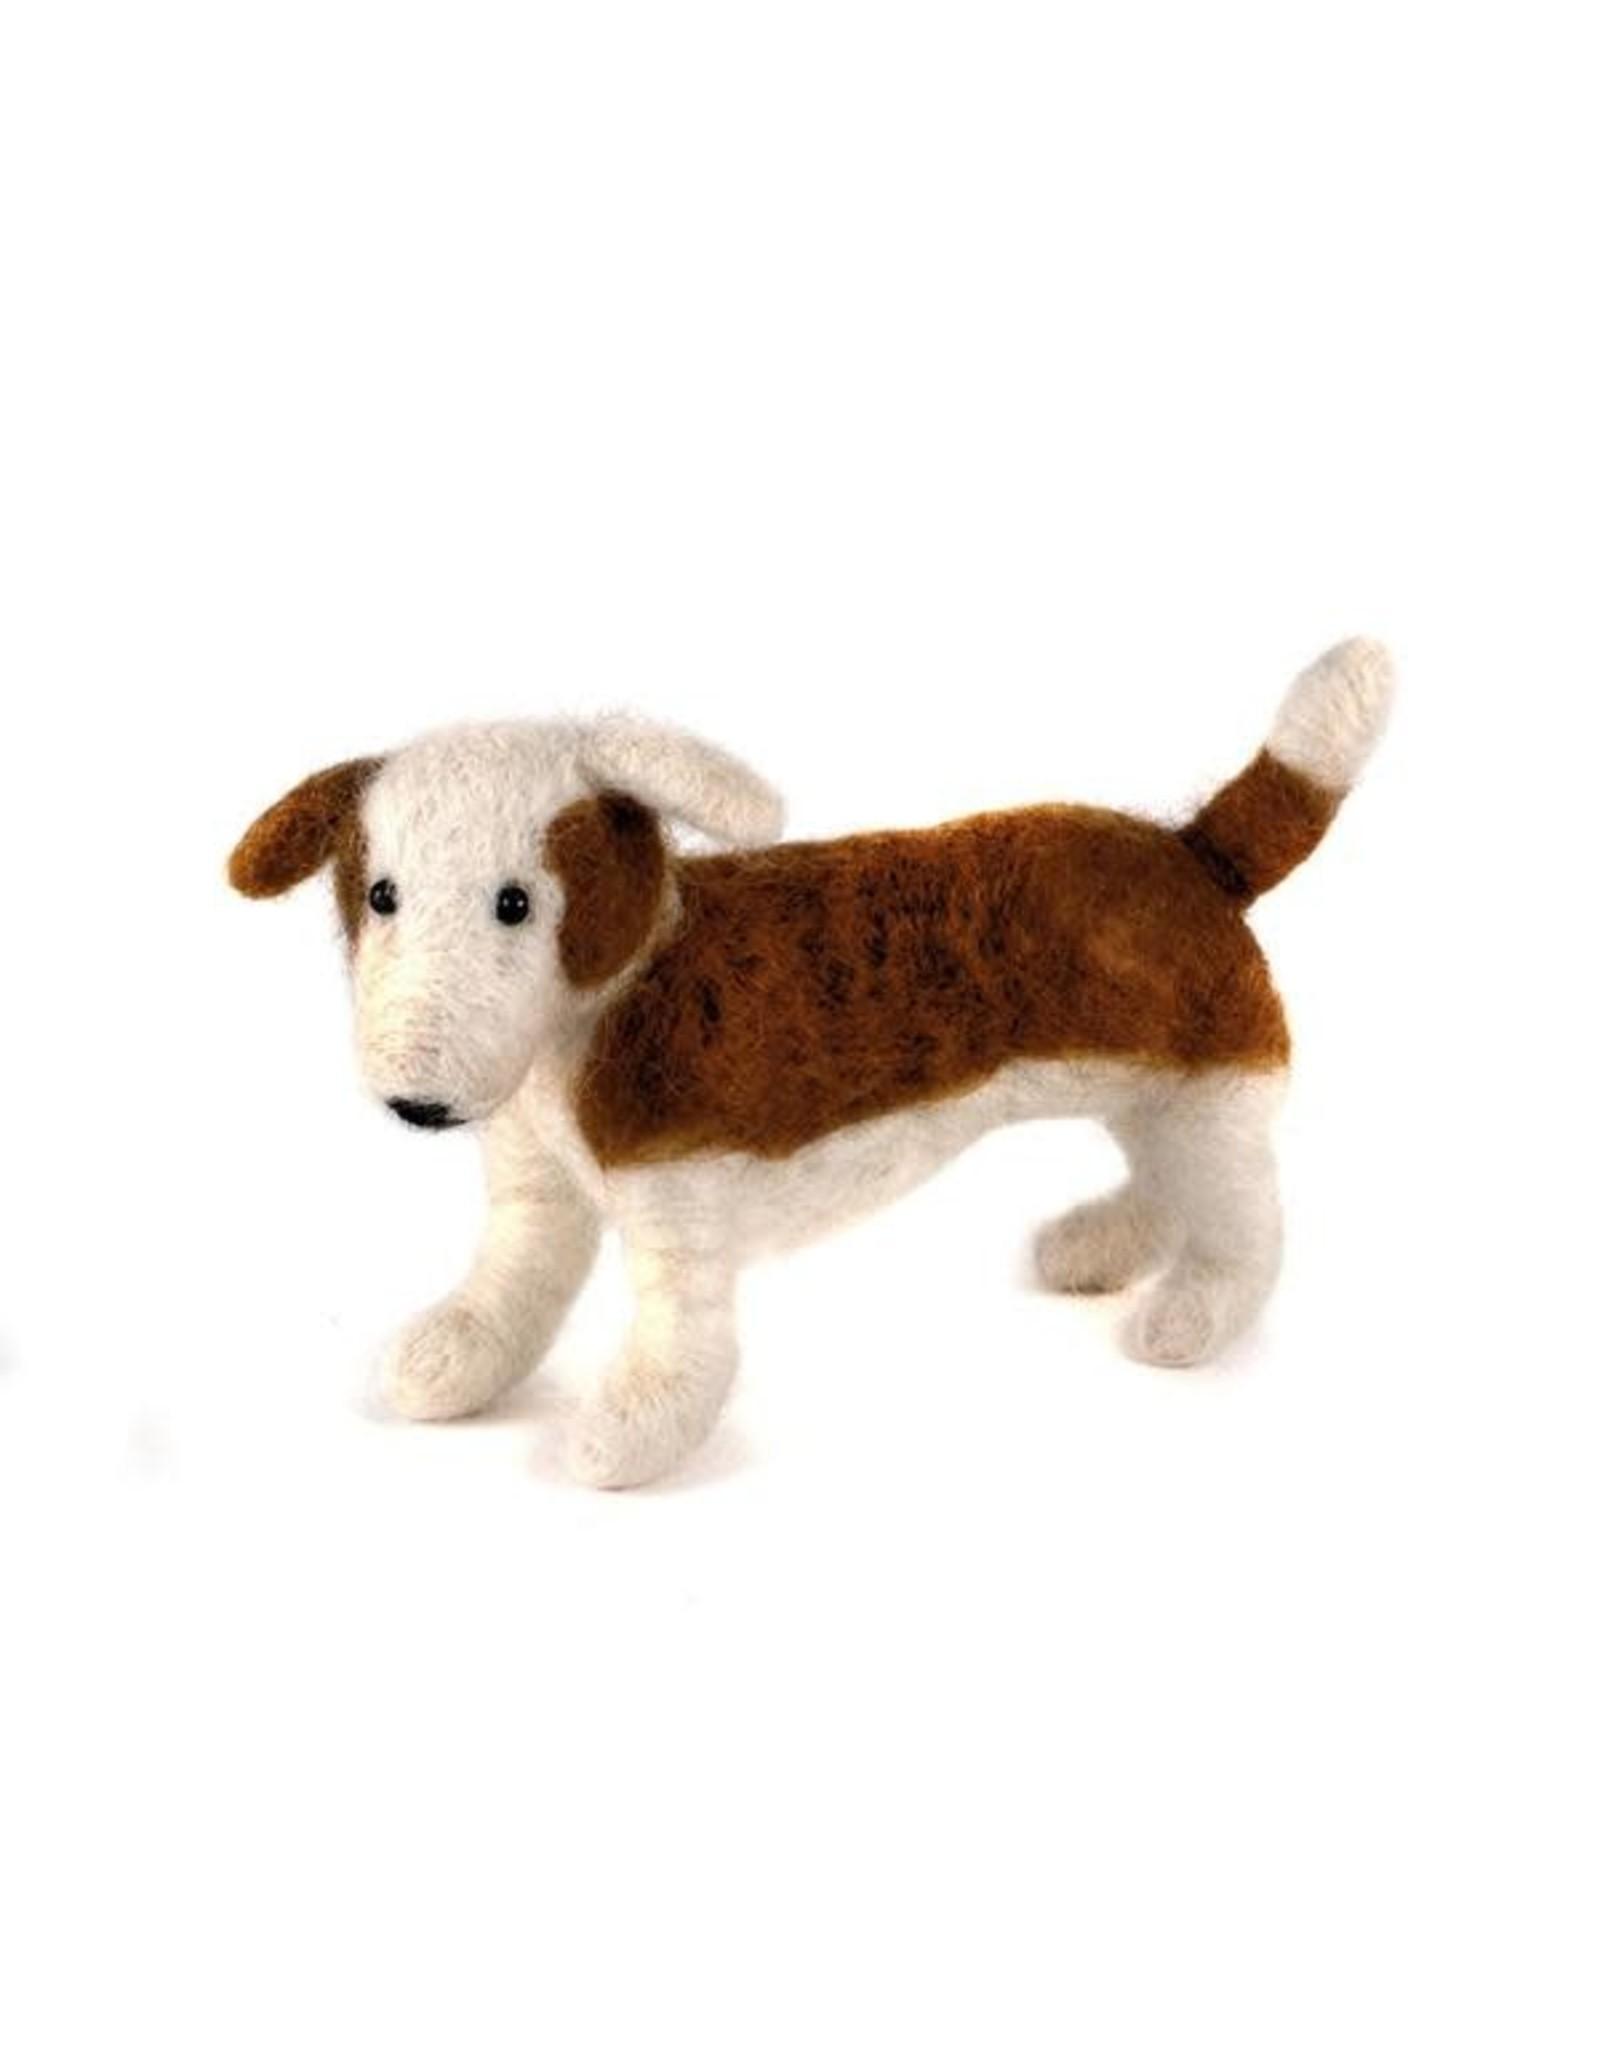 Felted Wool Animal, Standing Dog, Guatemala